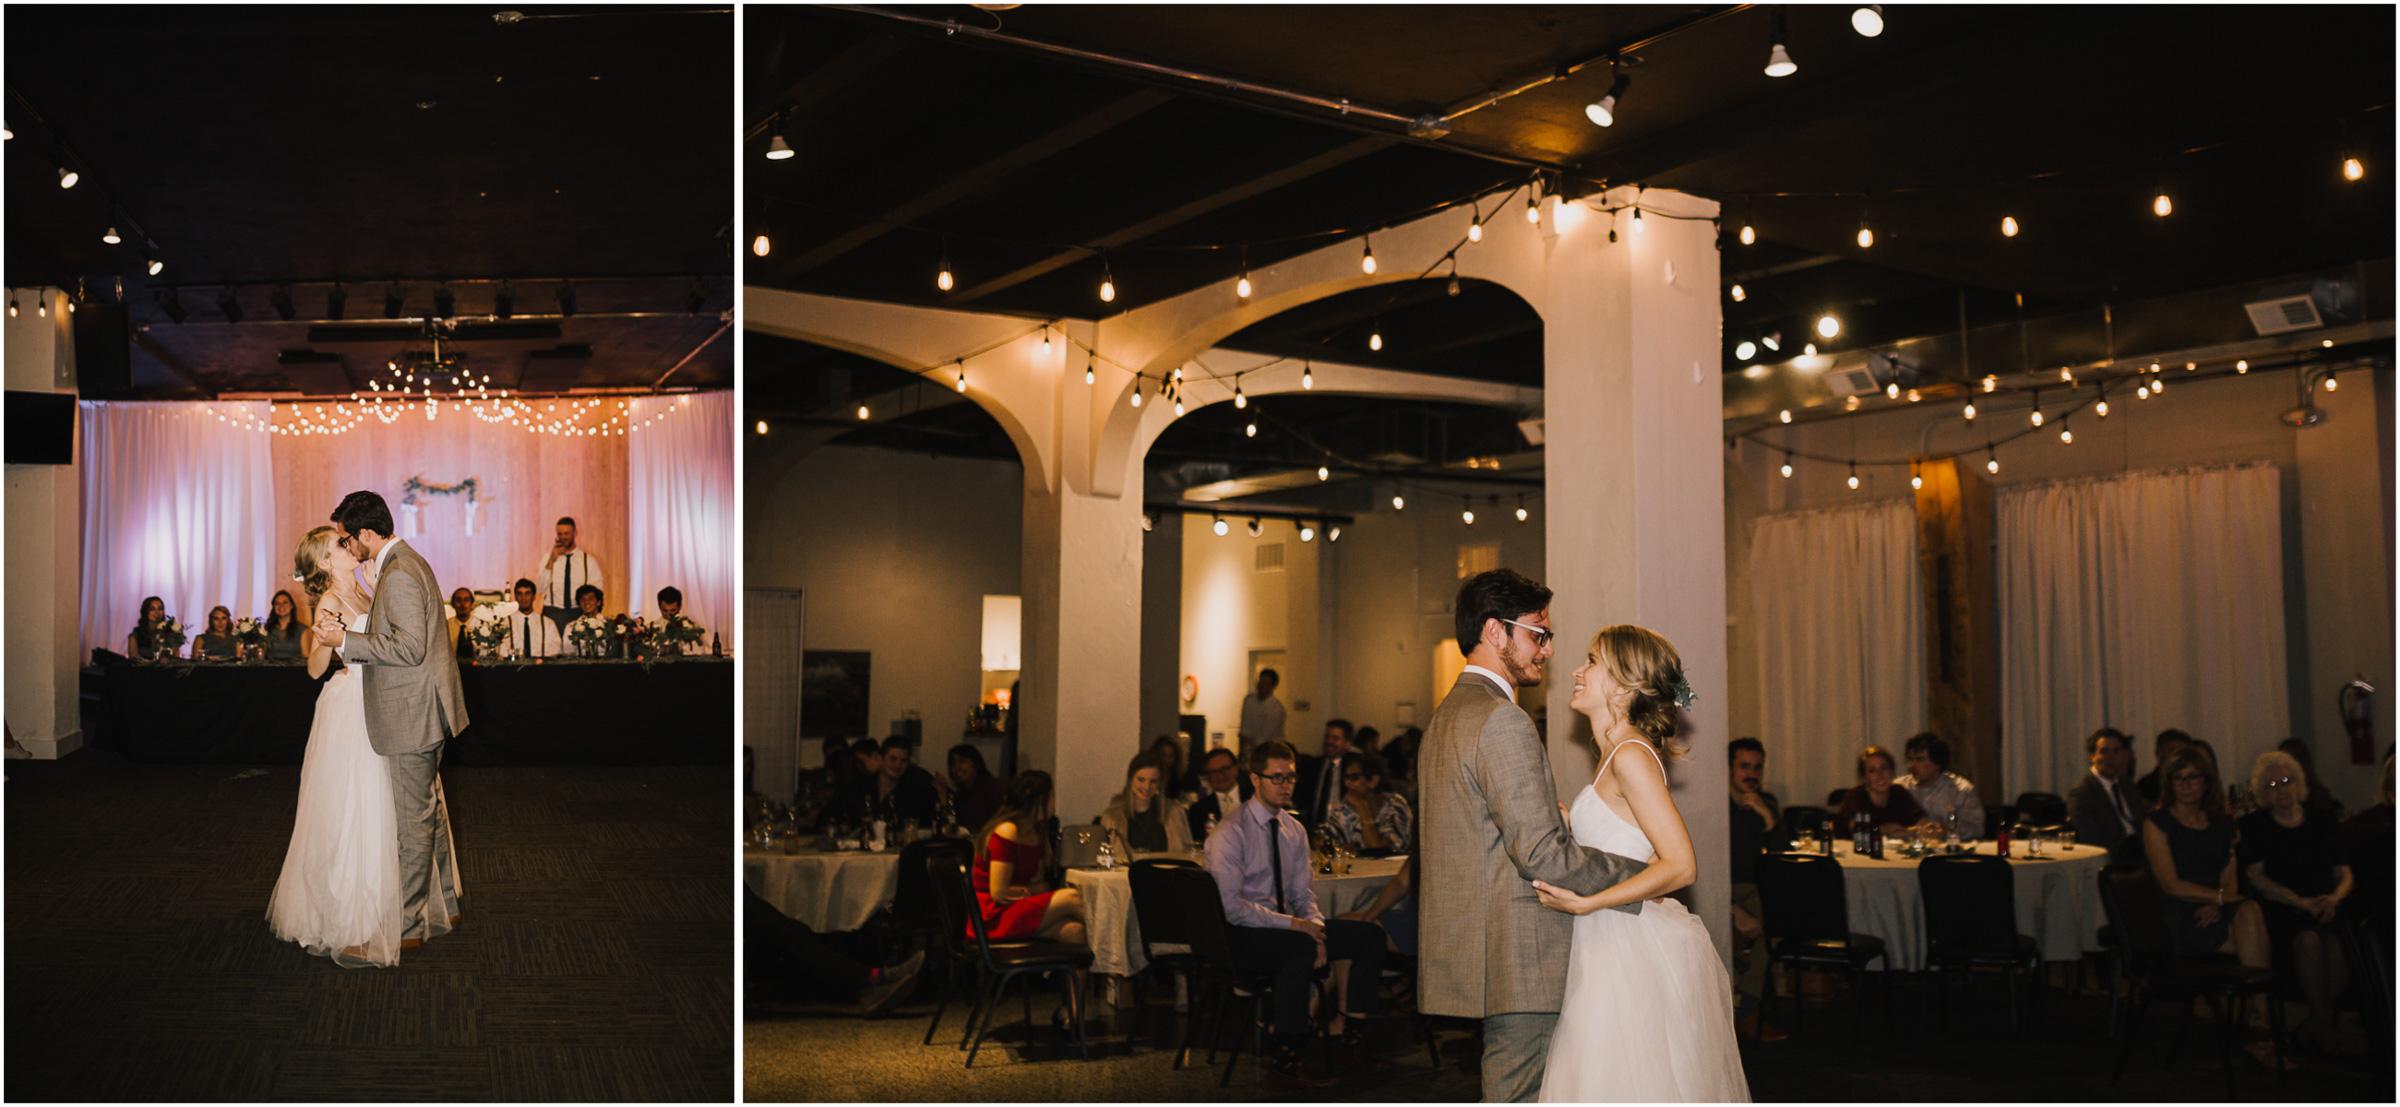 alyssa barletter photography midtown kansas city wedding el torreon kcmo fall october wedding photography-50.jpg